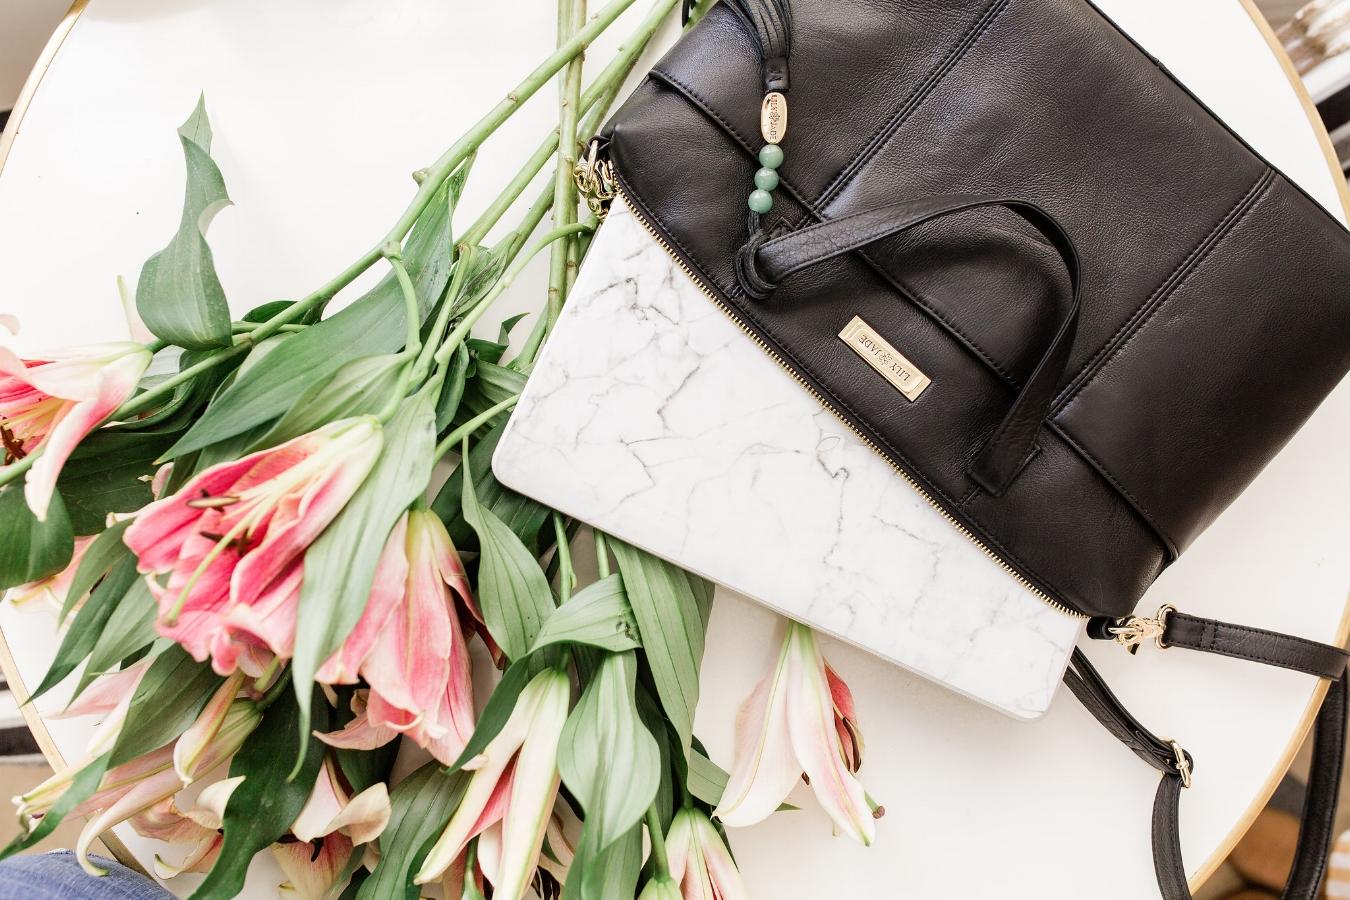 Lily Jade Diaper Bag review for Petite Frames plus Black Friday Sale